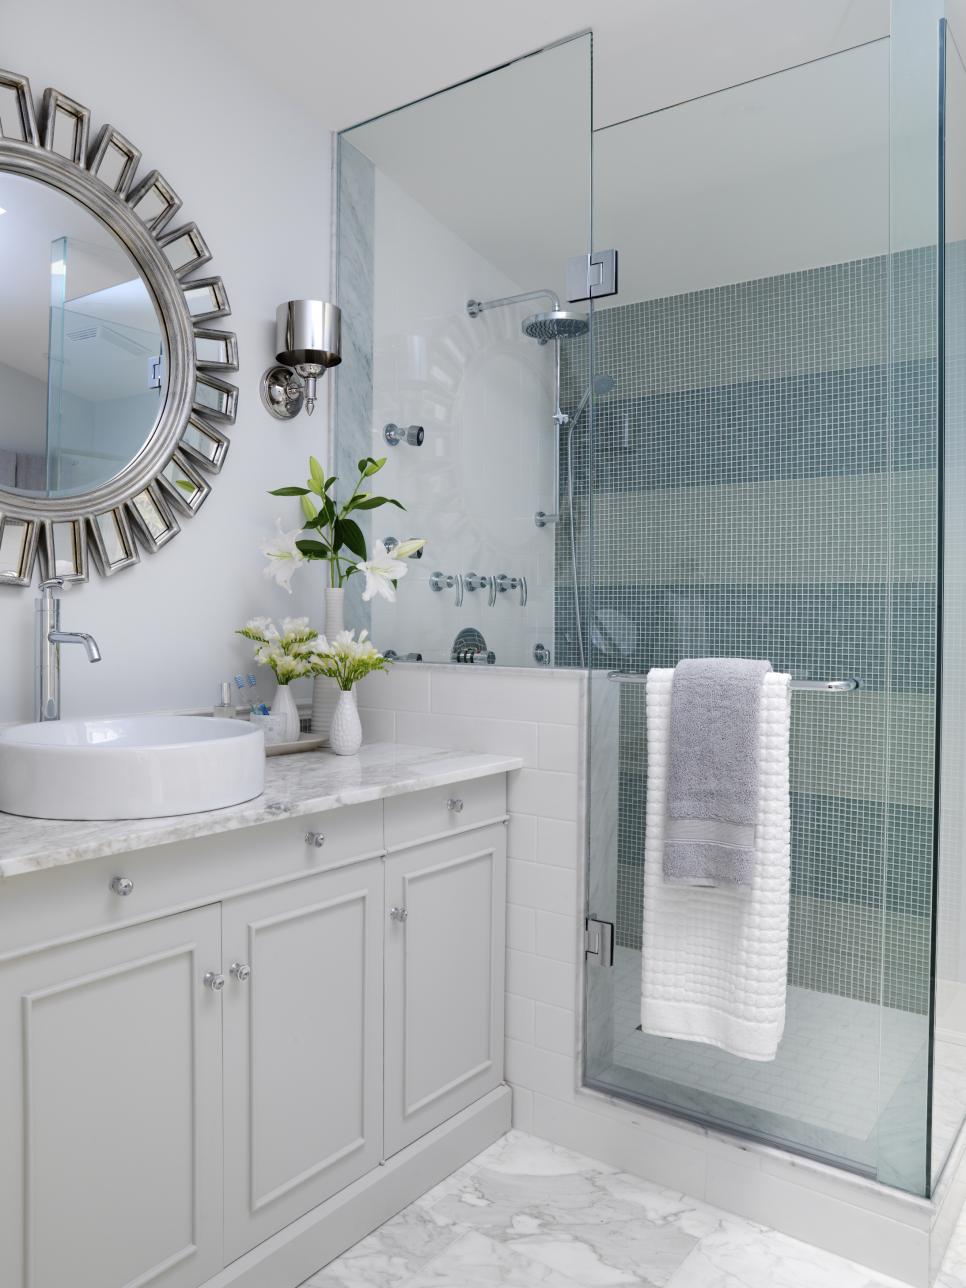 bathroom tiles 15 simply chic bathroom tile design ideas   hgtv IJQWGYK